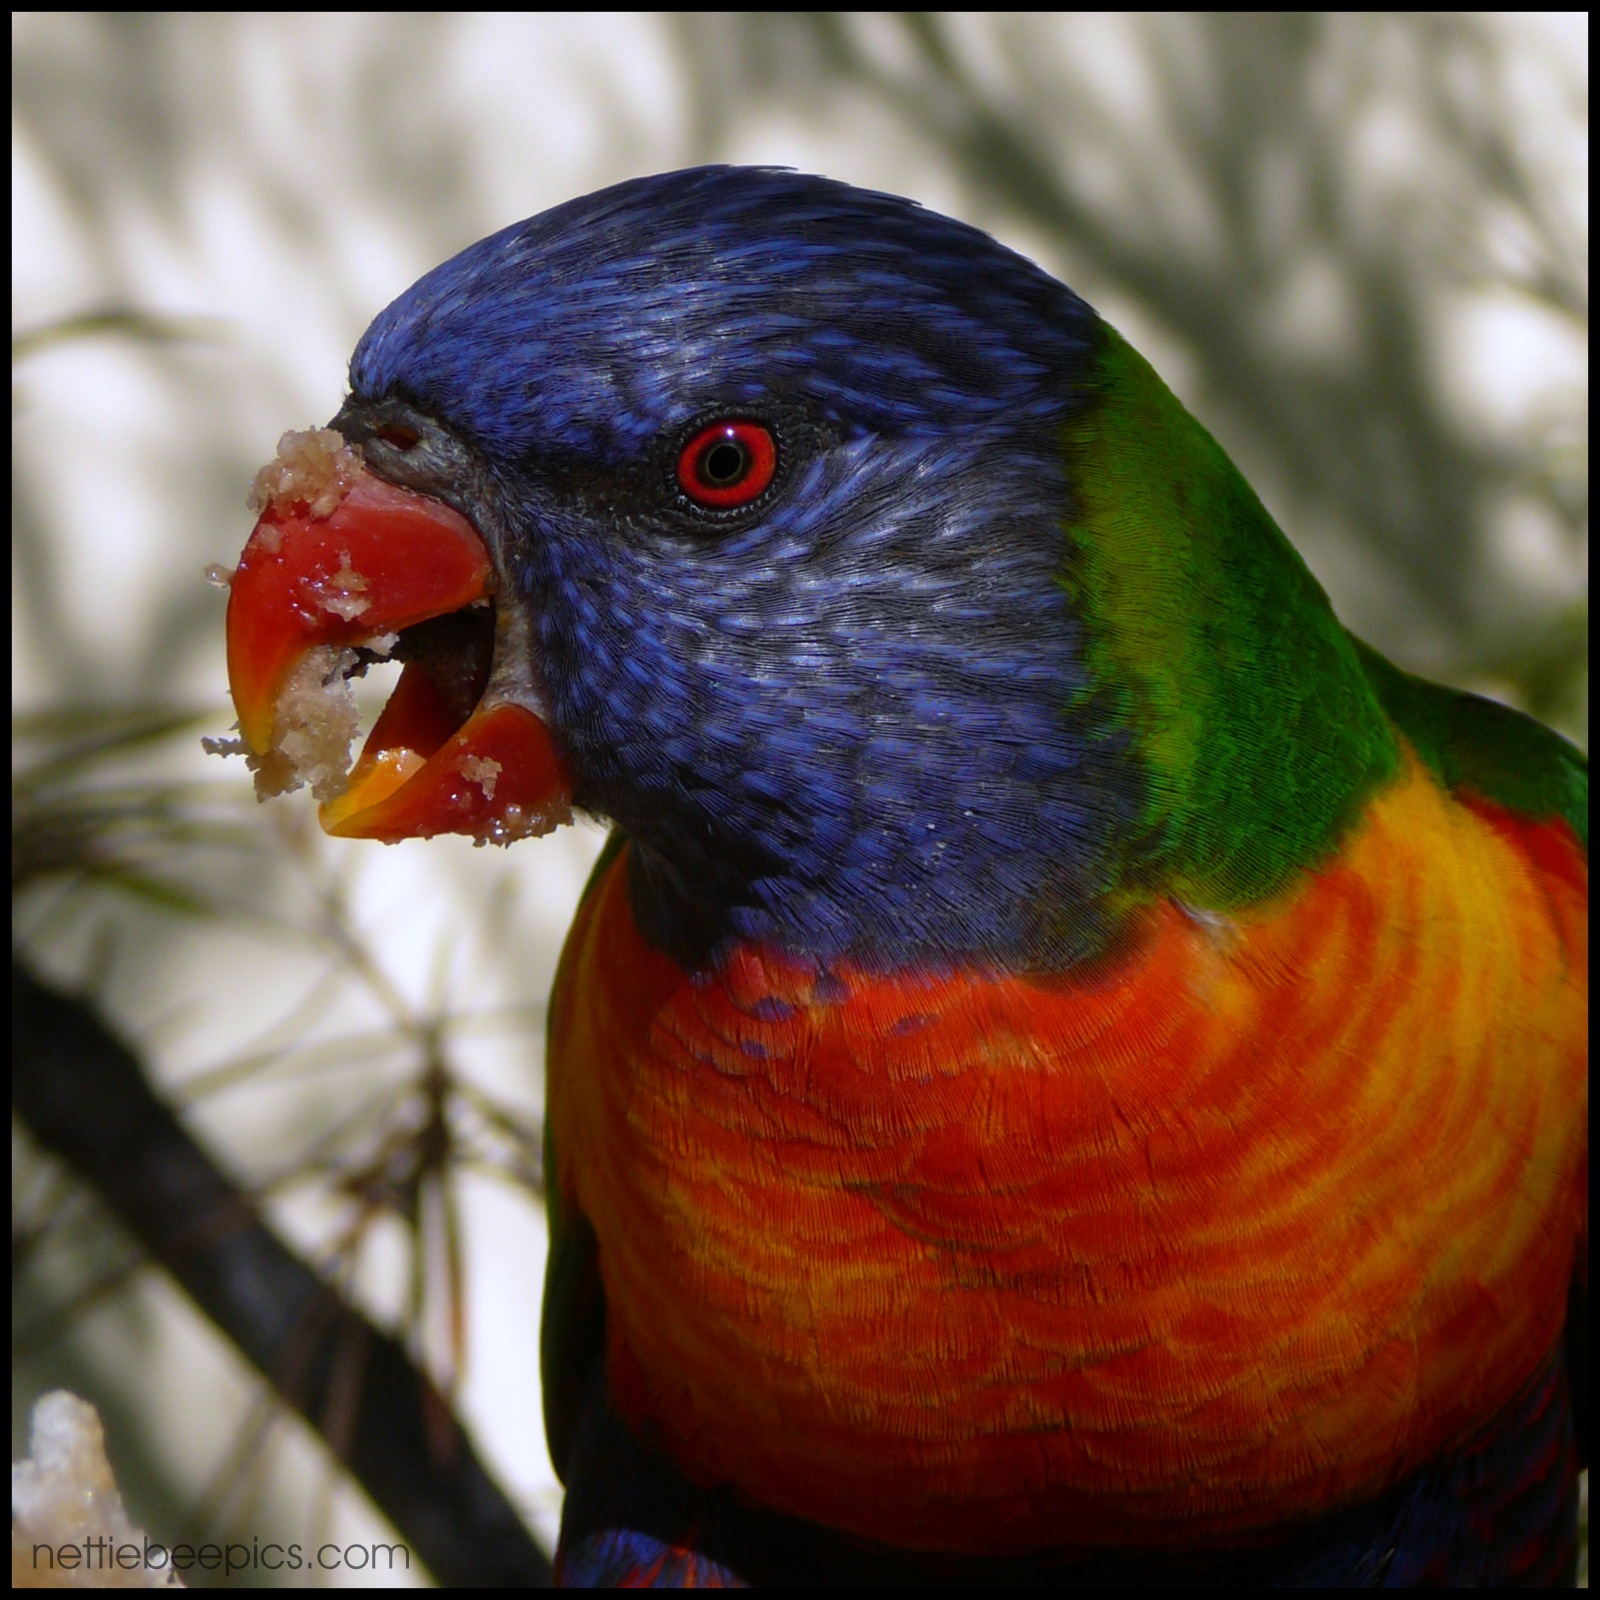 Rainbow Lorikeet with Sticky Beak Close Up by Nettie Bee